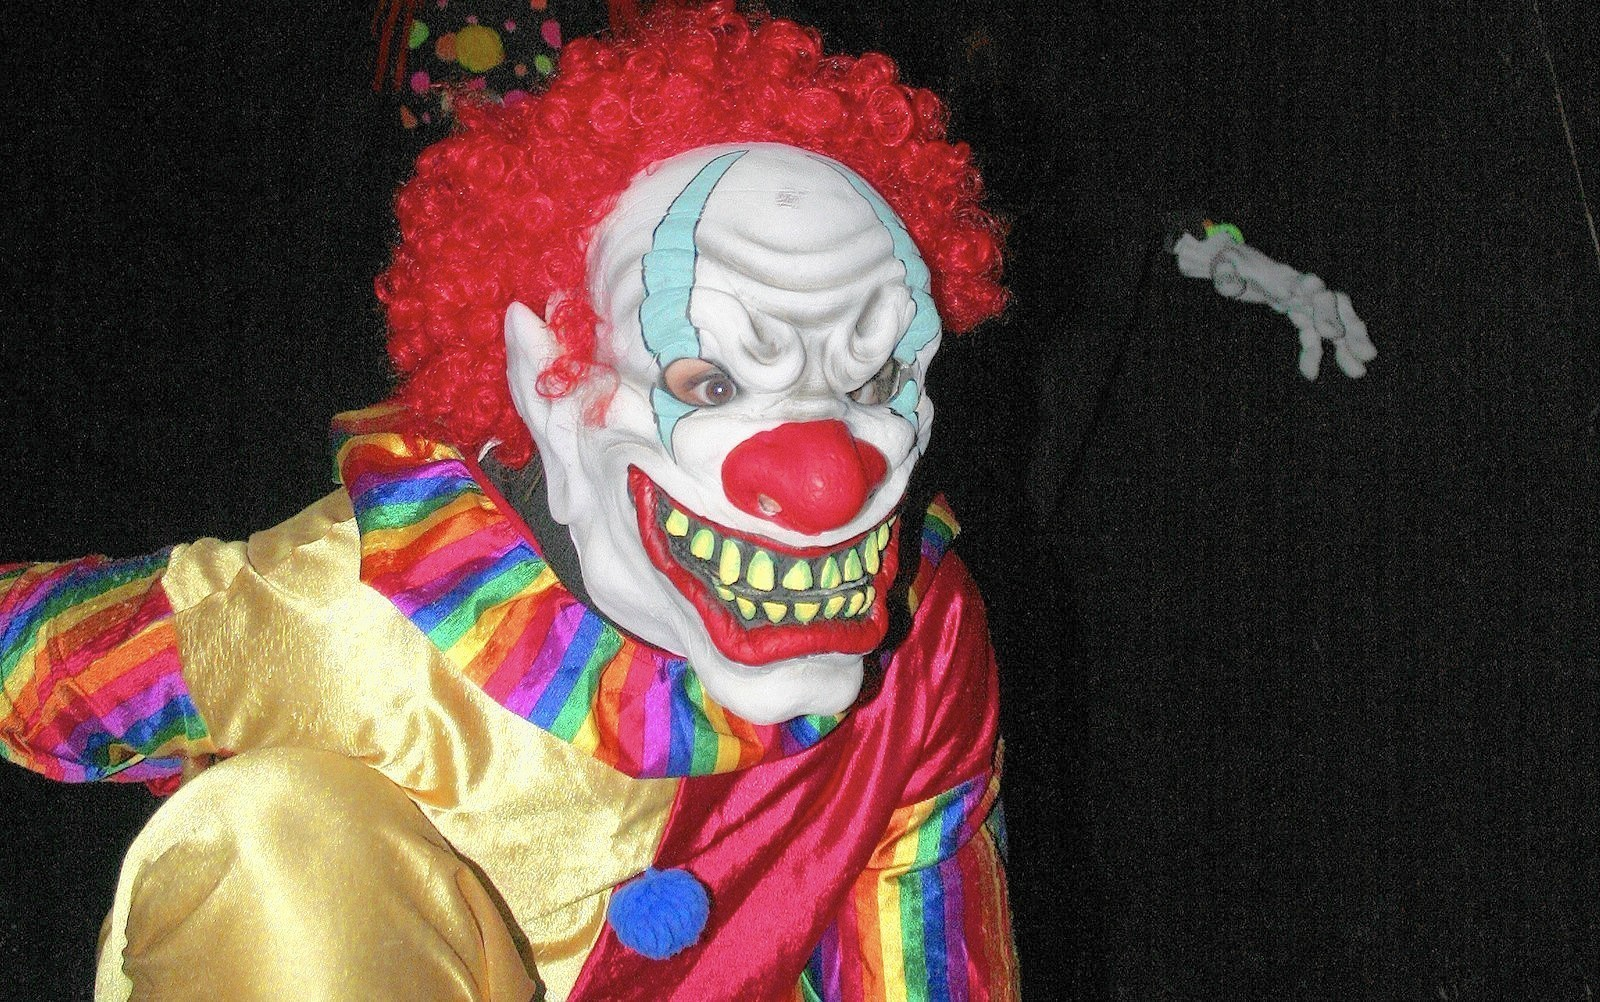 national creepy clown phenomenon hits lake county lake county